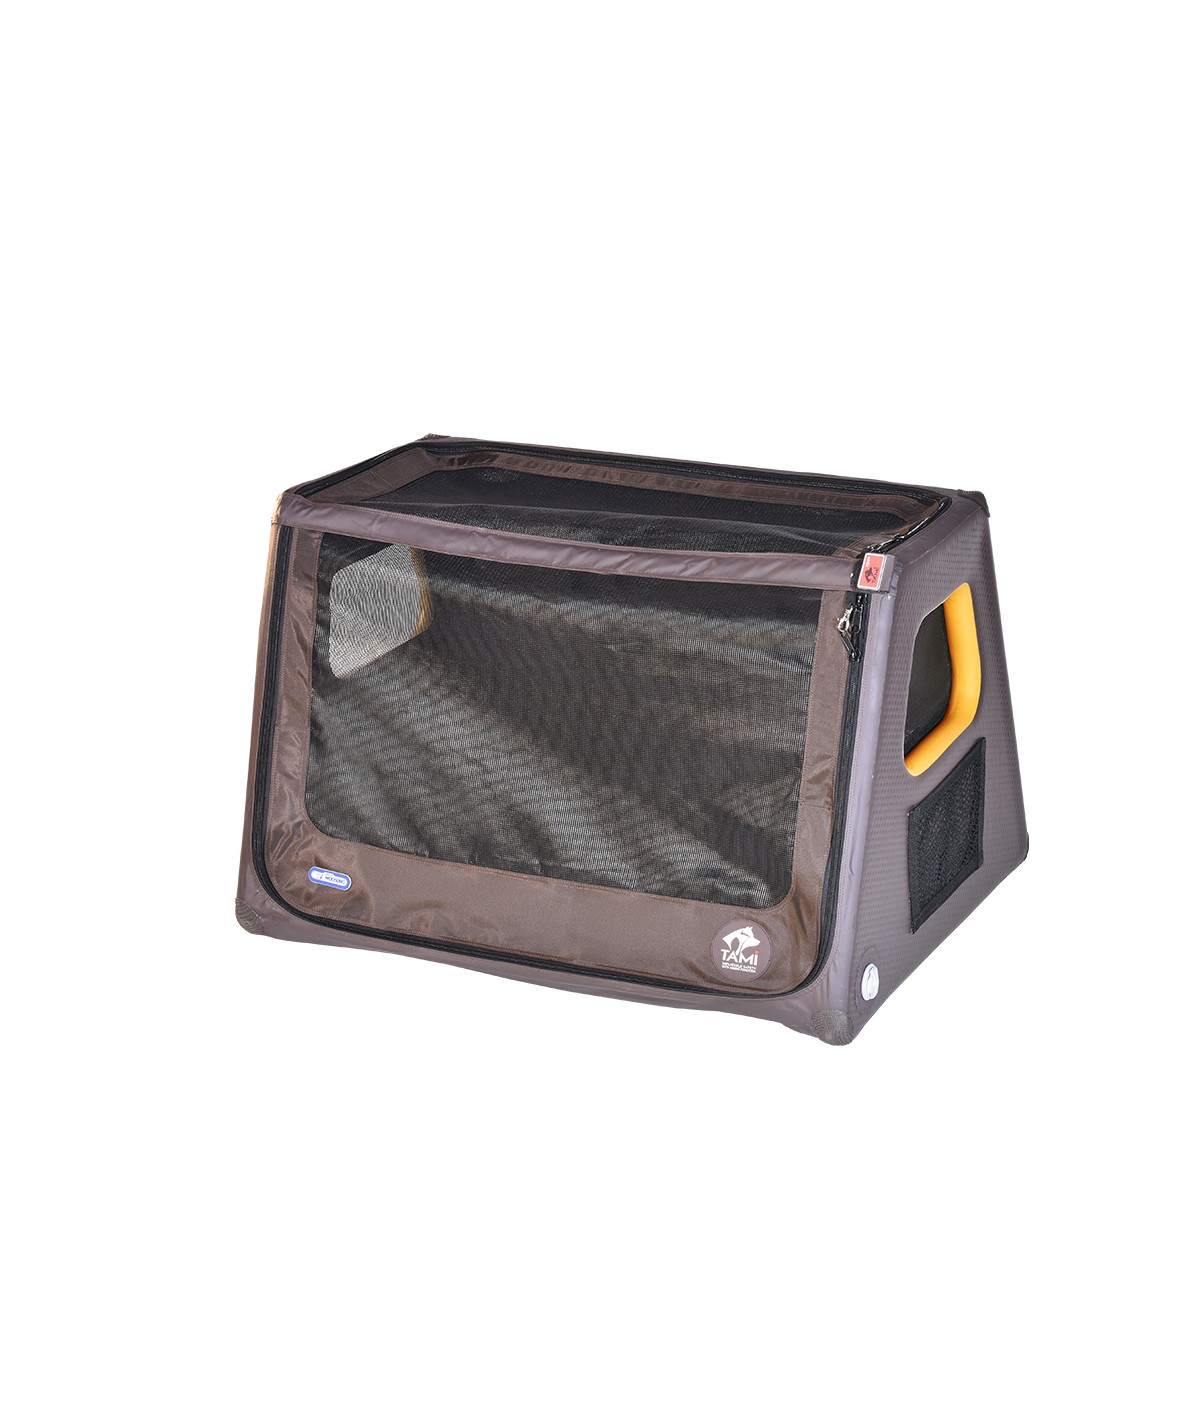 Tami Dogbox Backseat Größe XL